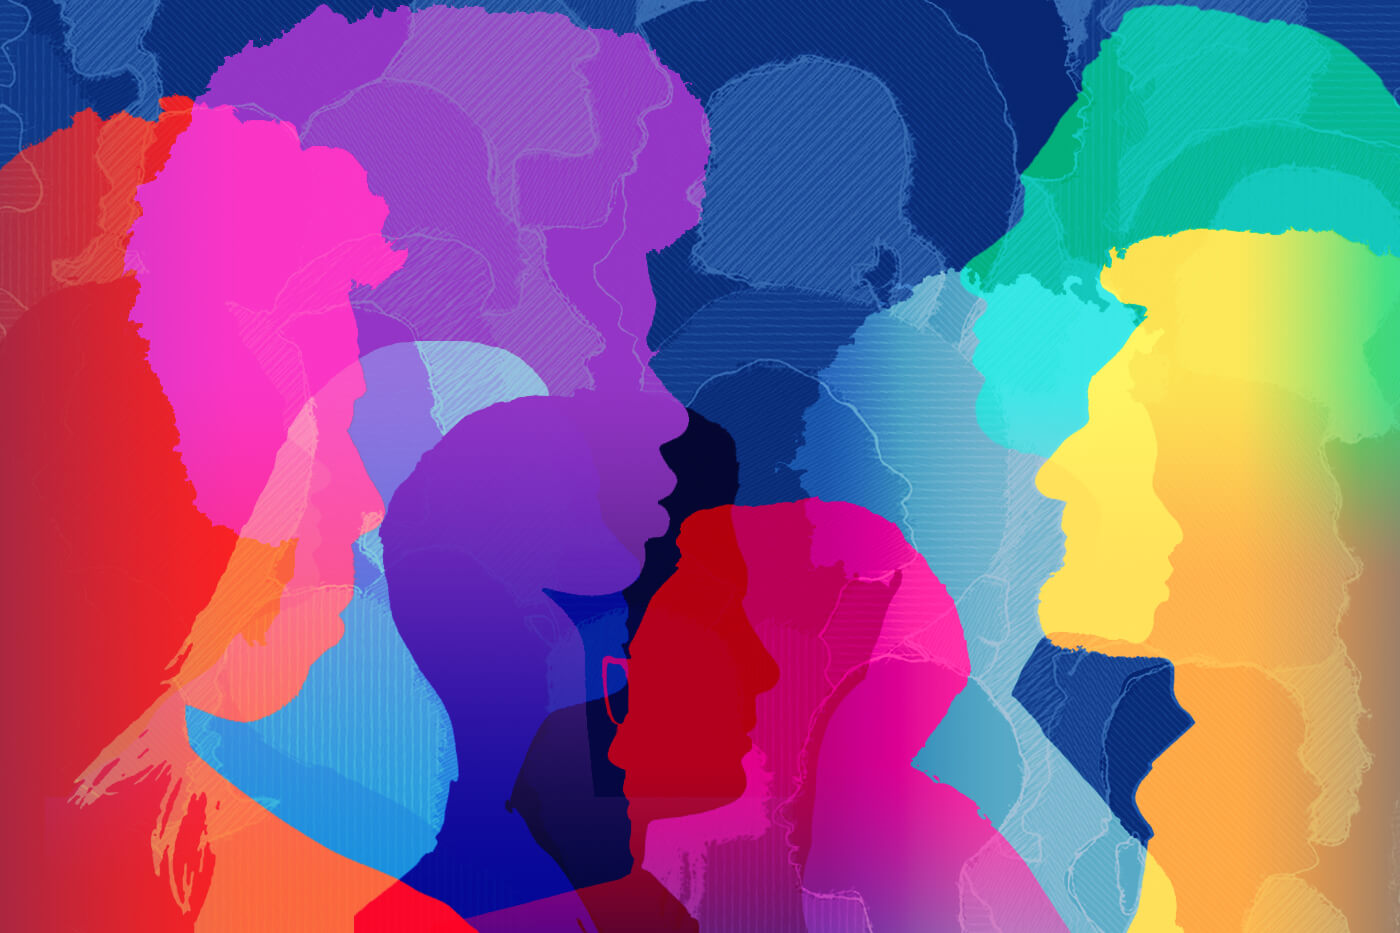 Inclusion & Diversity at Codurance